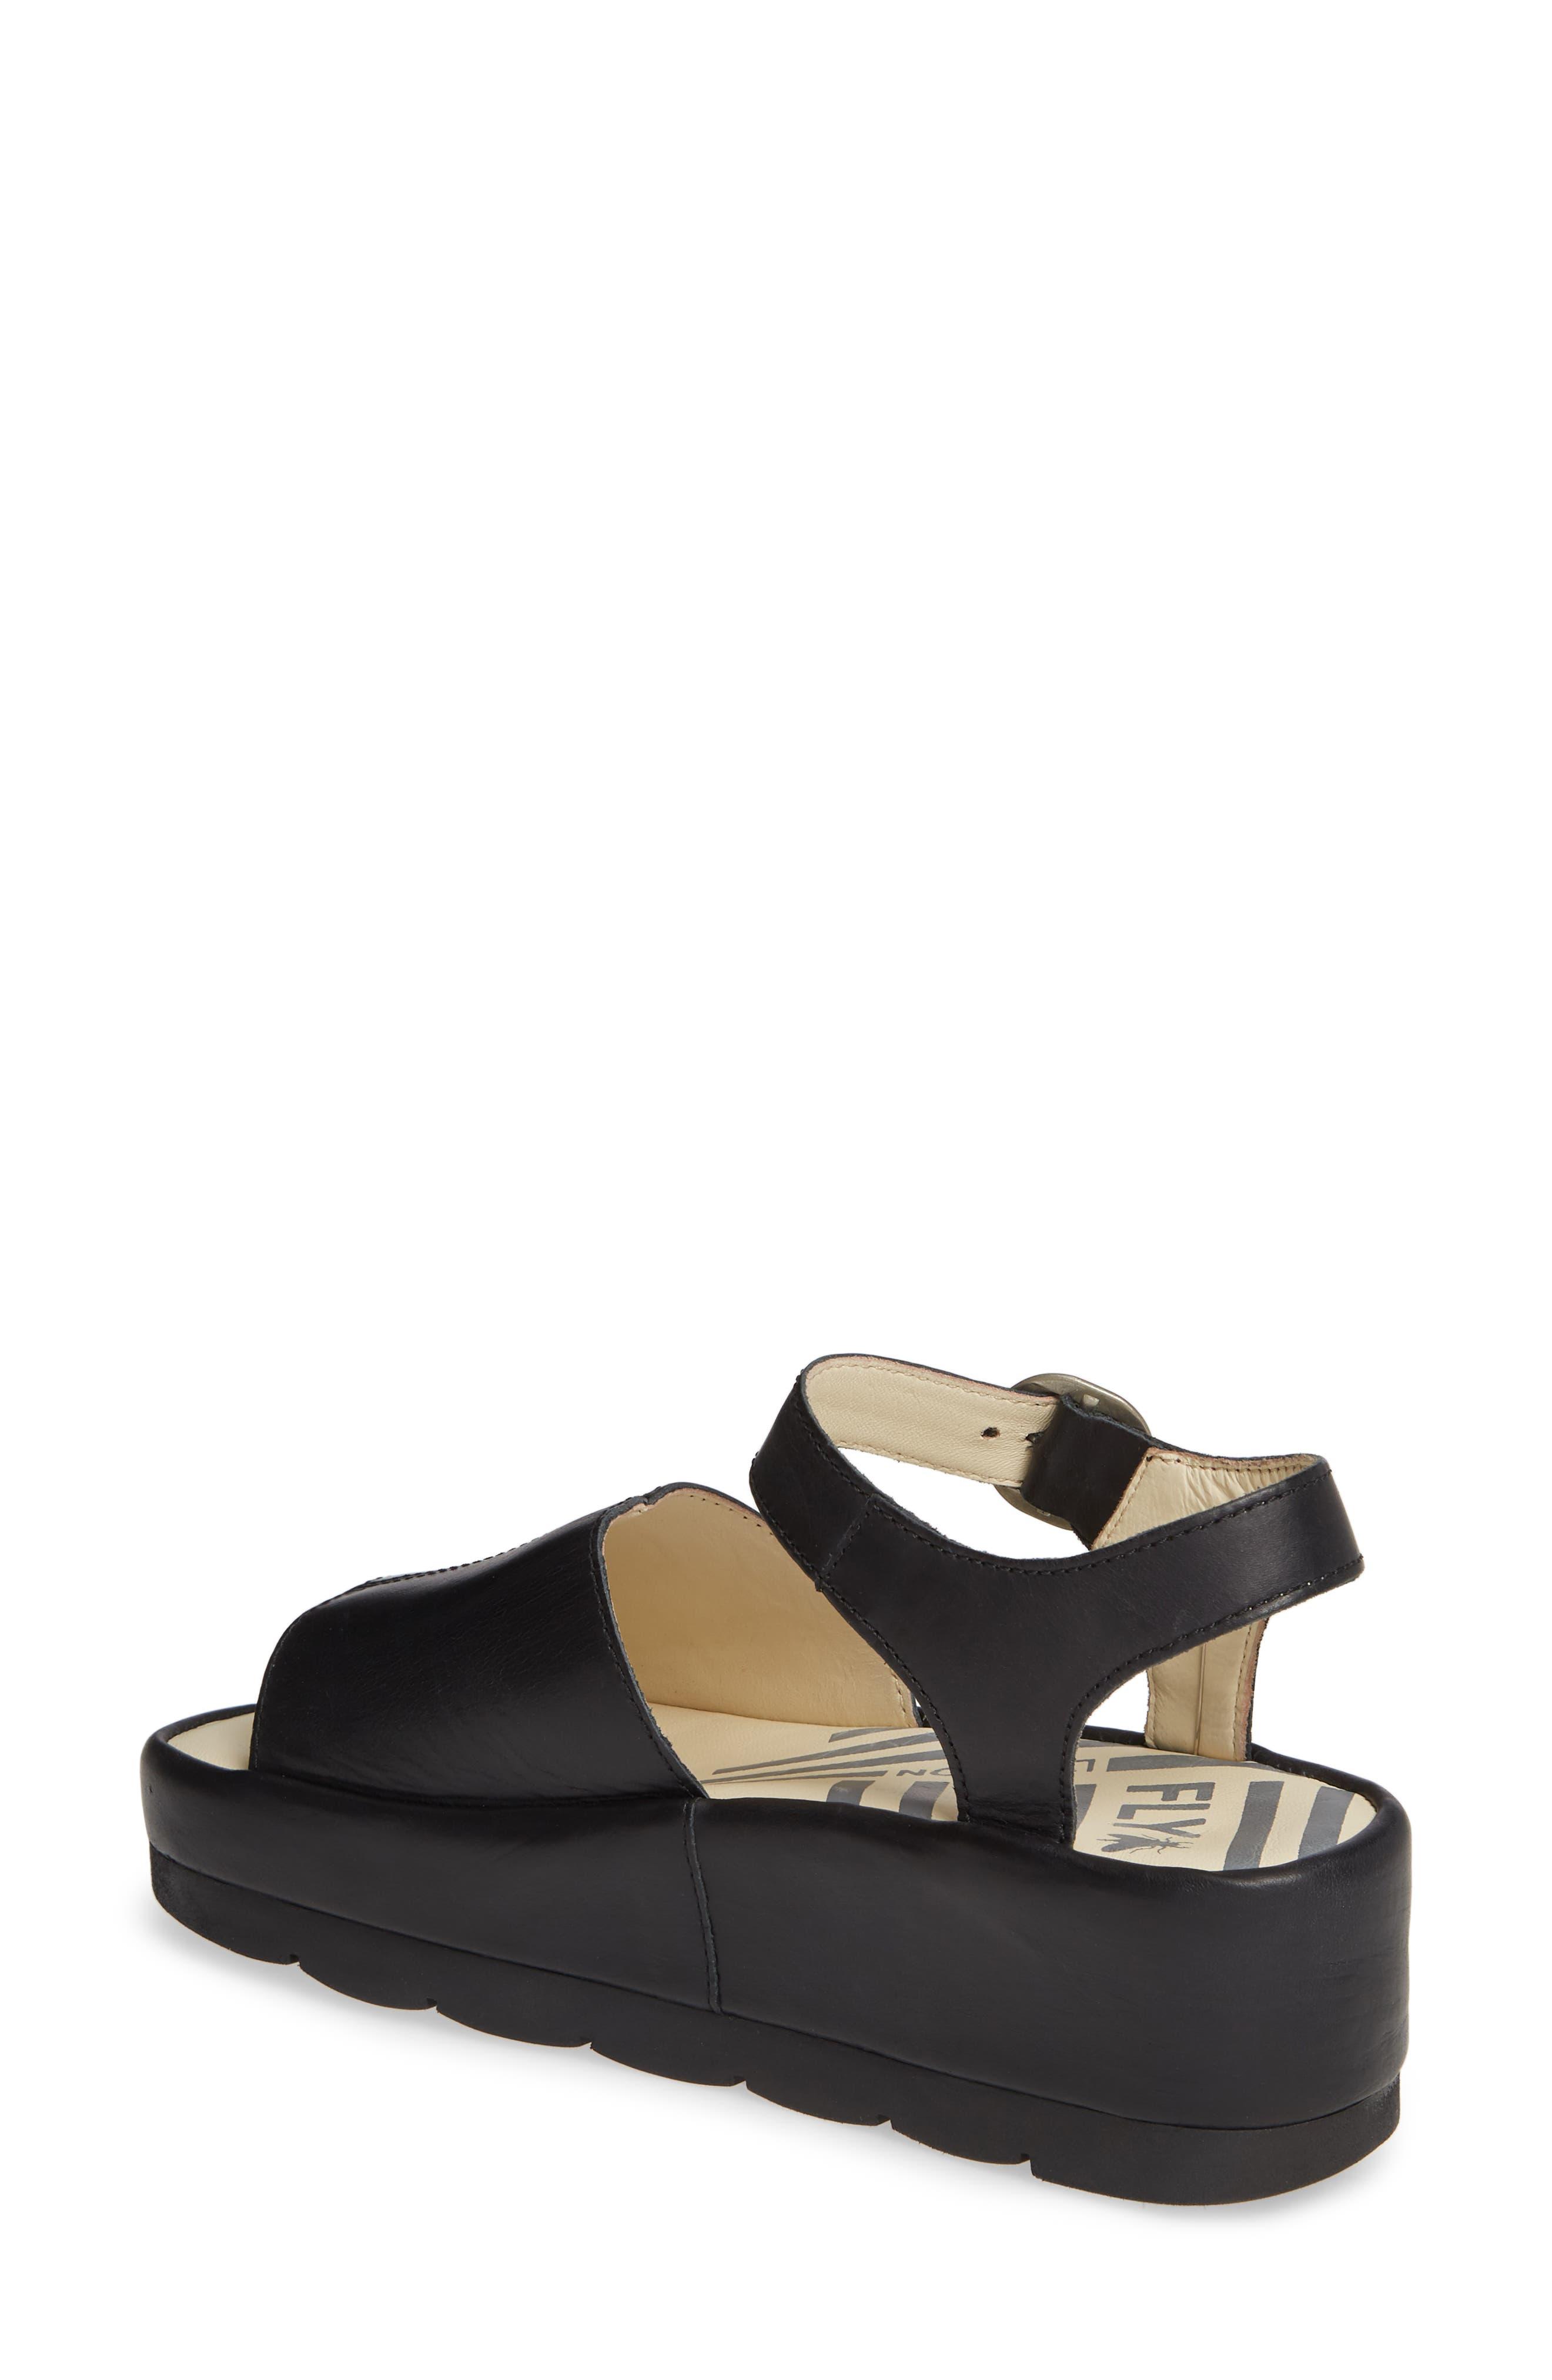 FLY LONDON, Bano Platform Sandal, Alternate thumbnail 2, color, BLACK LEATHER